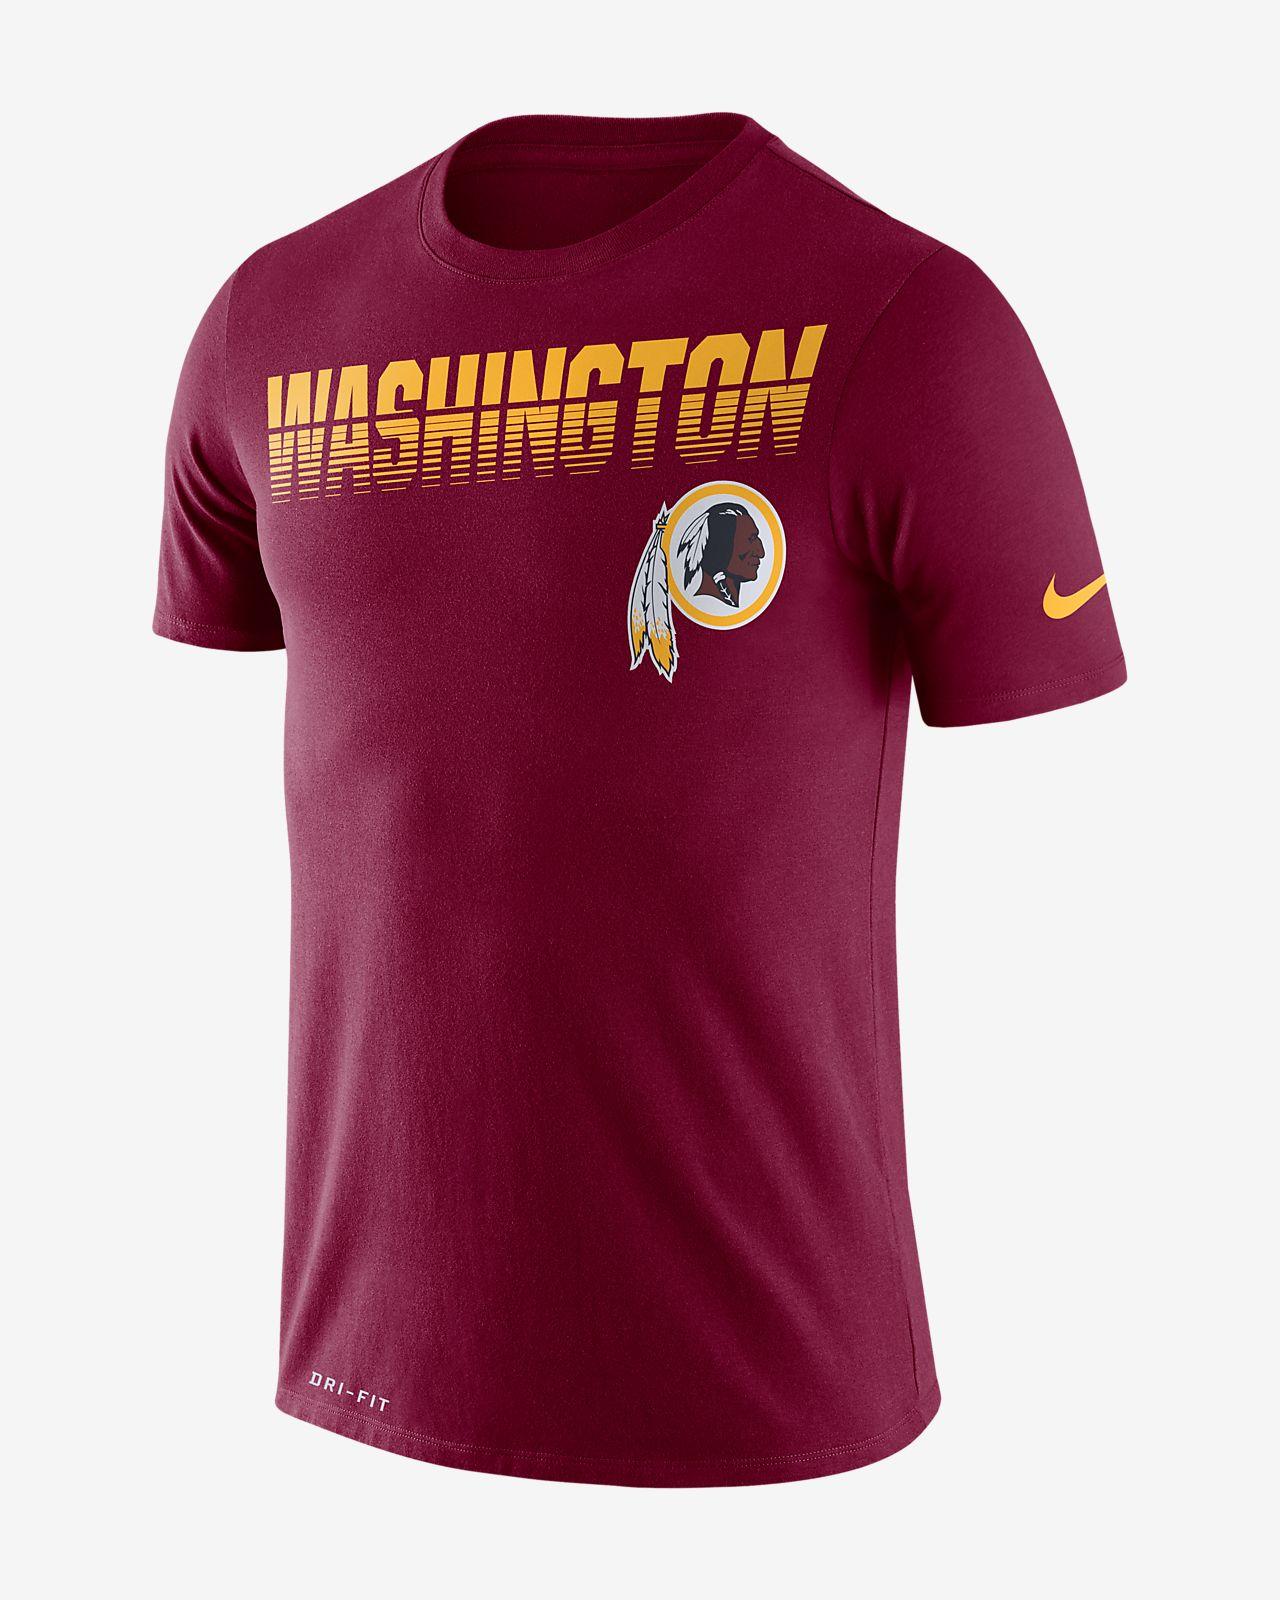 the best attitude 74fb7 44820 Nike Legend (NFL Redskins) Men's Long-Sleeve T-Shirt